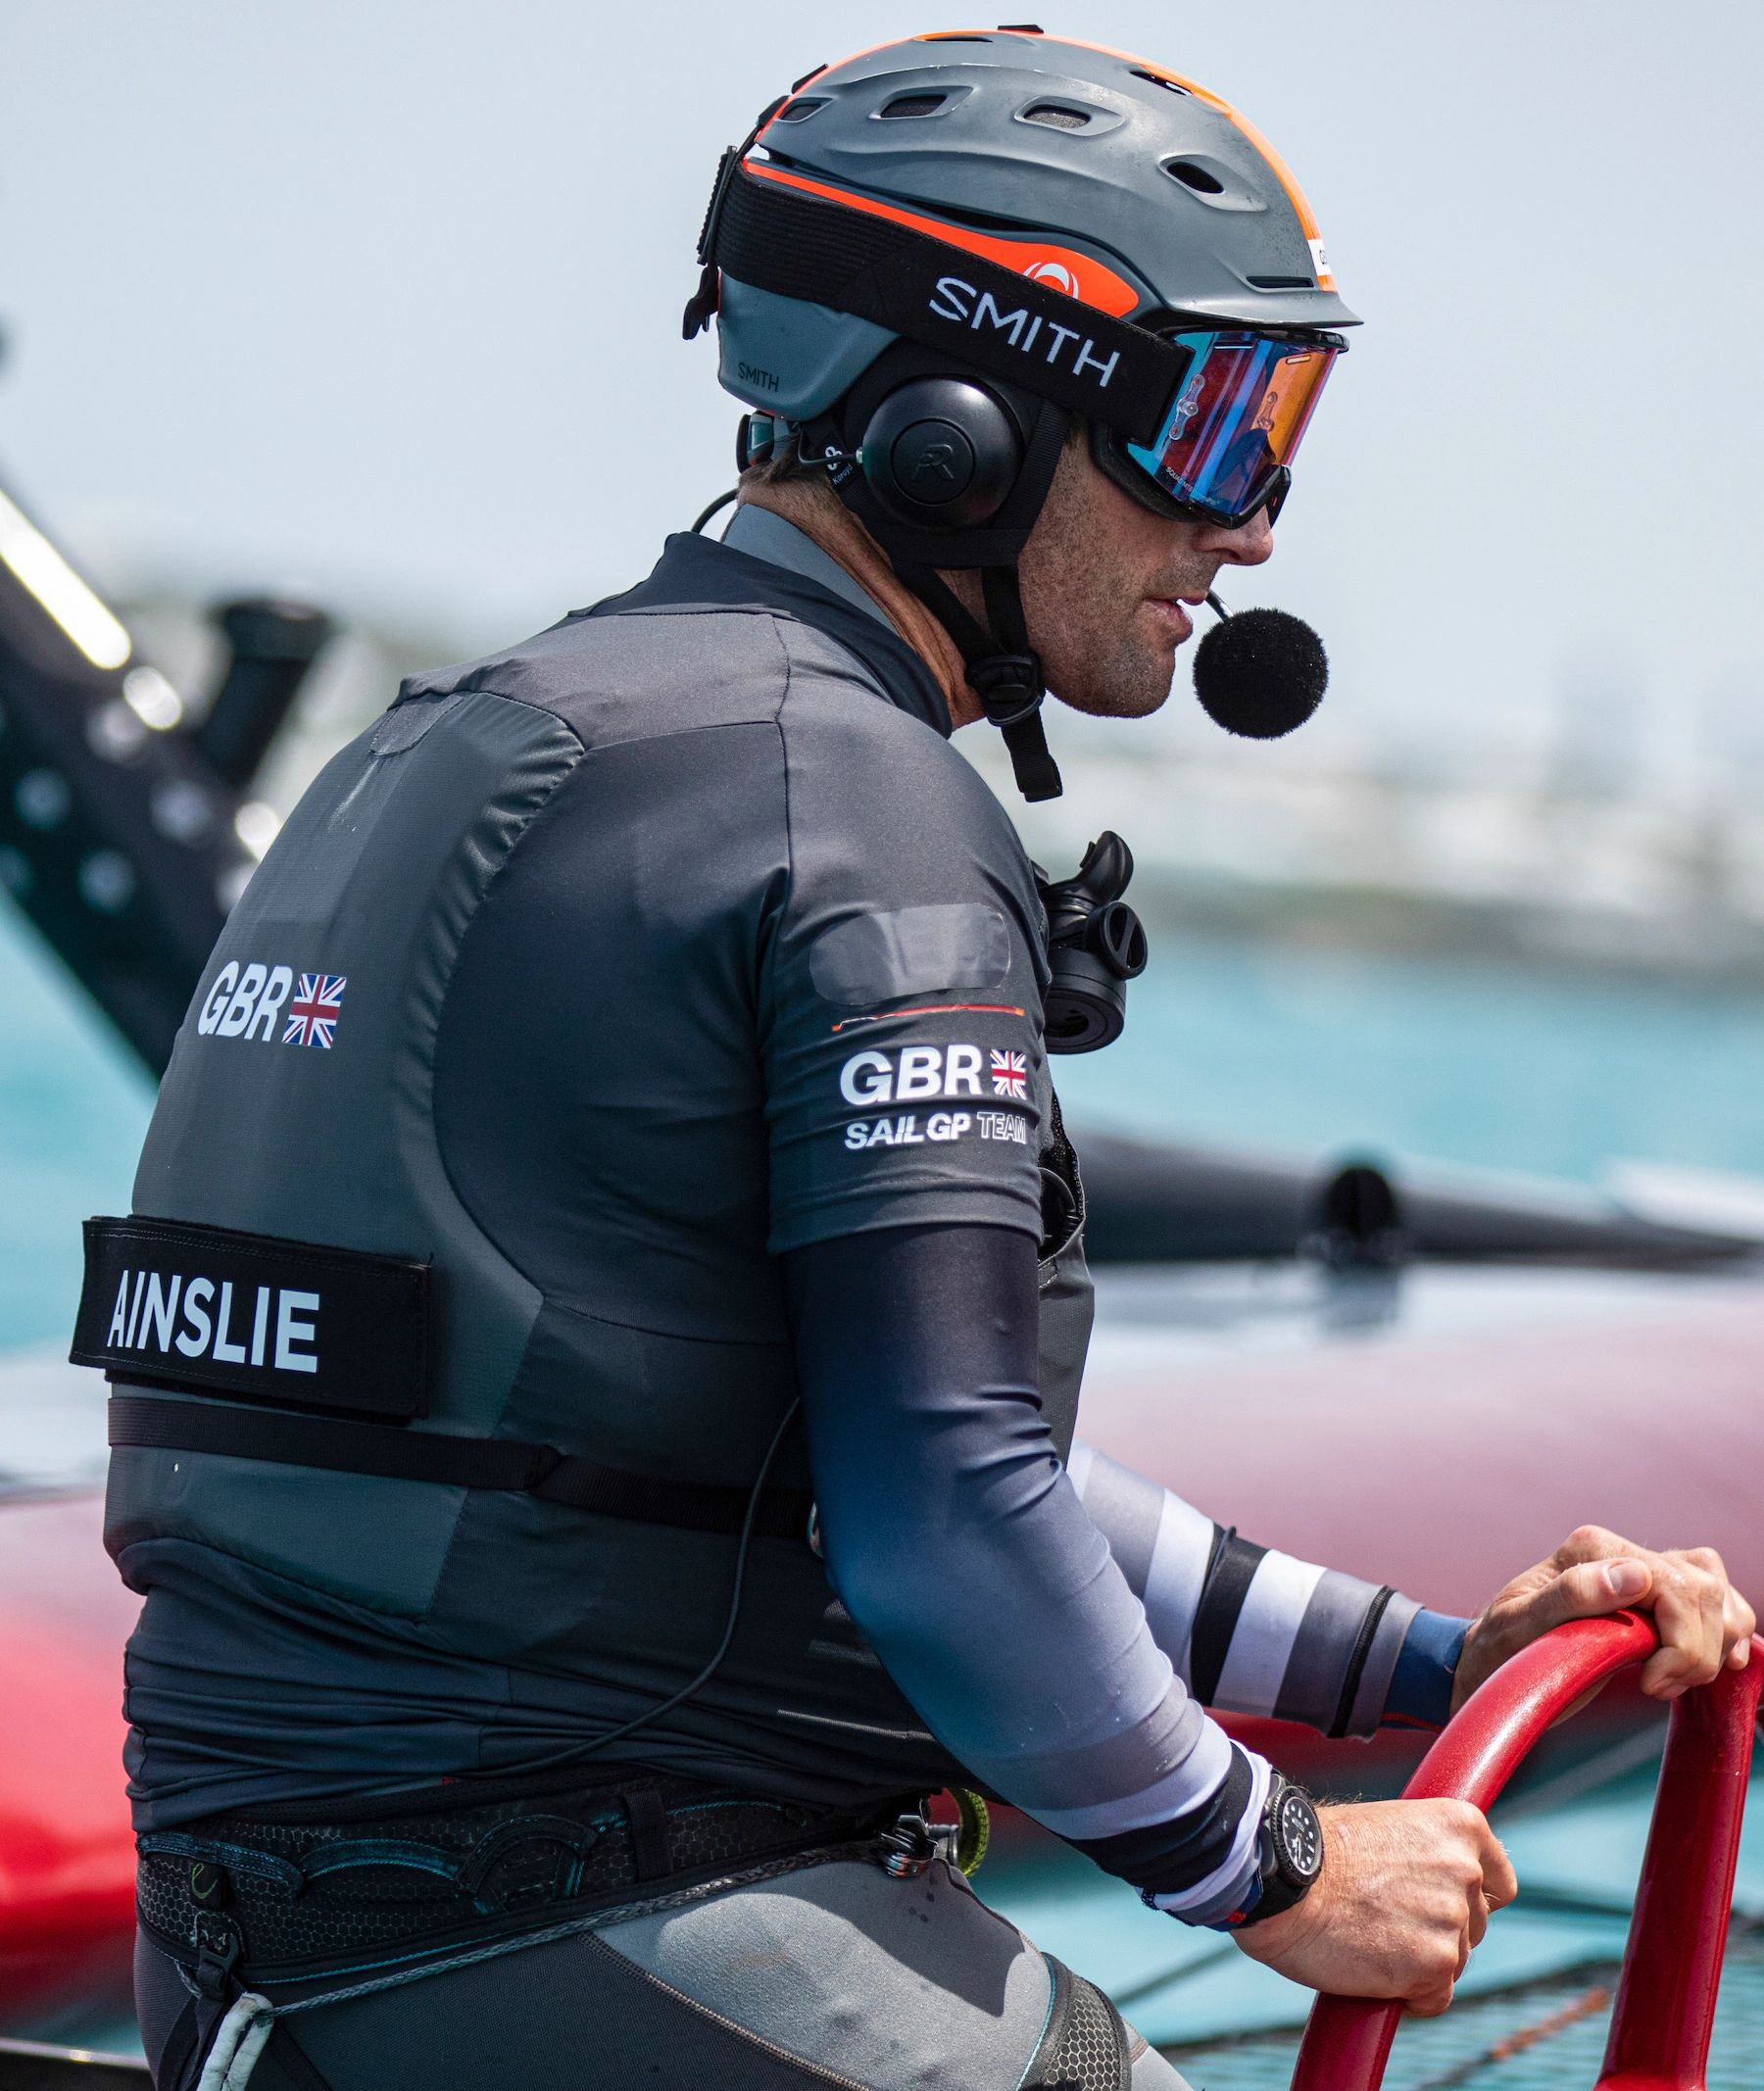 Sir Ben Ainslie, Rolex Testimonee and helm of Great Britain SailGP Team © Rolex/Javier Salinas for SailGP